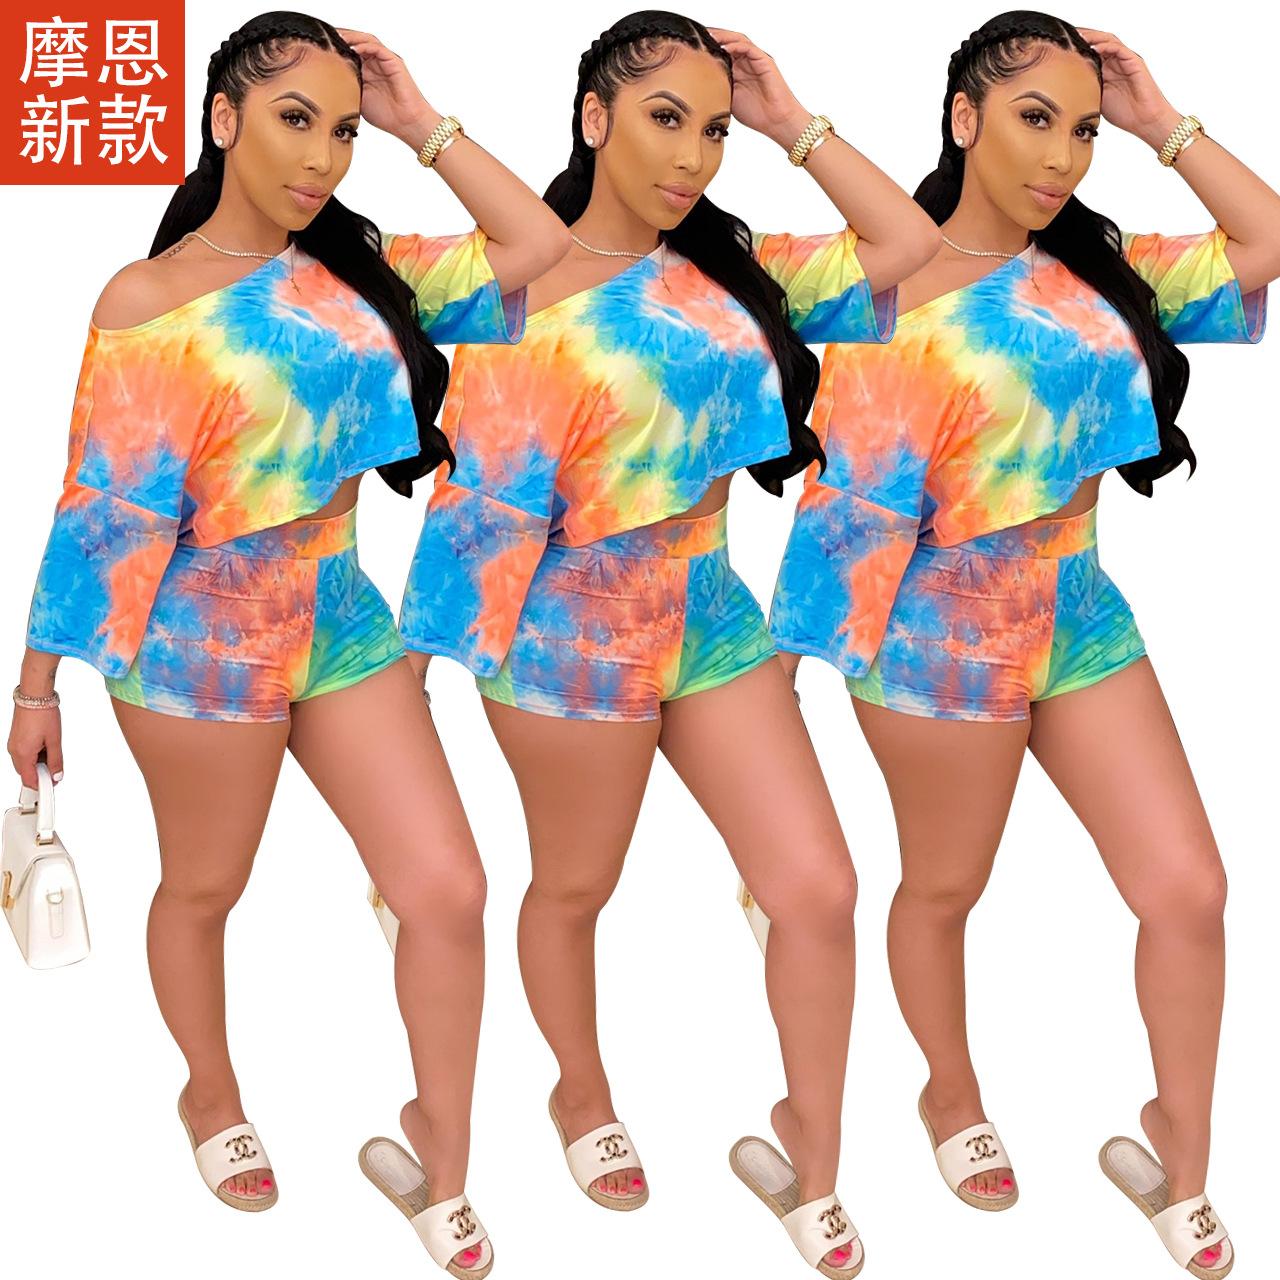 Q542  欧美女装 亚马逊女装 渐变色气质提臀修身微喇 两件套